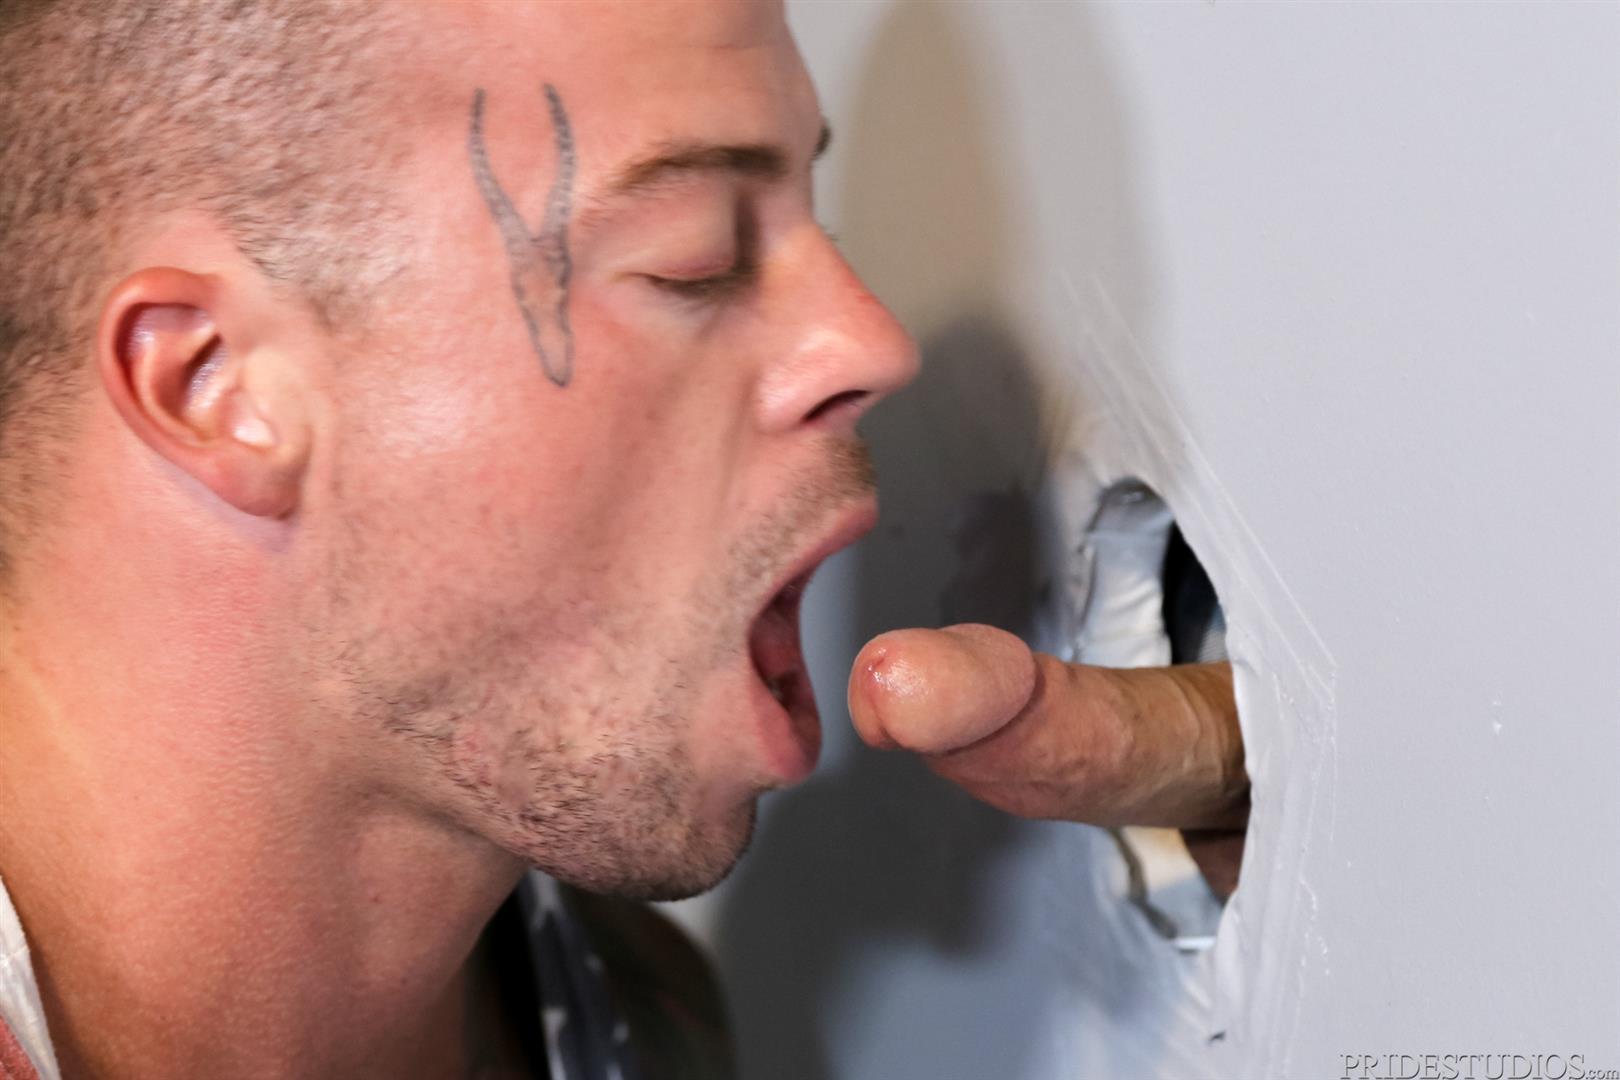 Extra-Big-Dicks-Sean-Duran-Fucking-Through-A-Glory-Hole-Amateur-Gay-Porn-04 Getting Fucked By A Big Fat Cock Through a Glory Hole